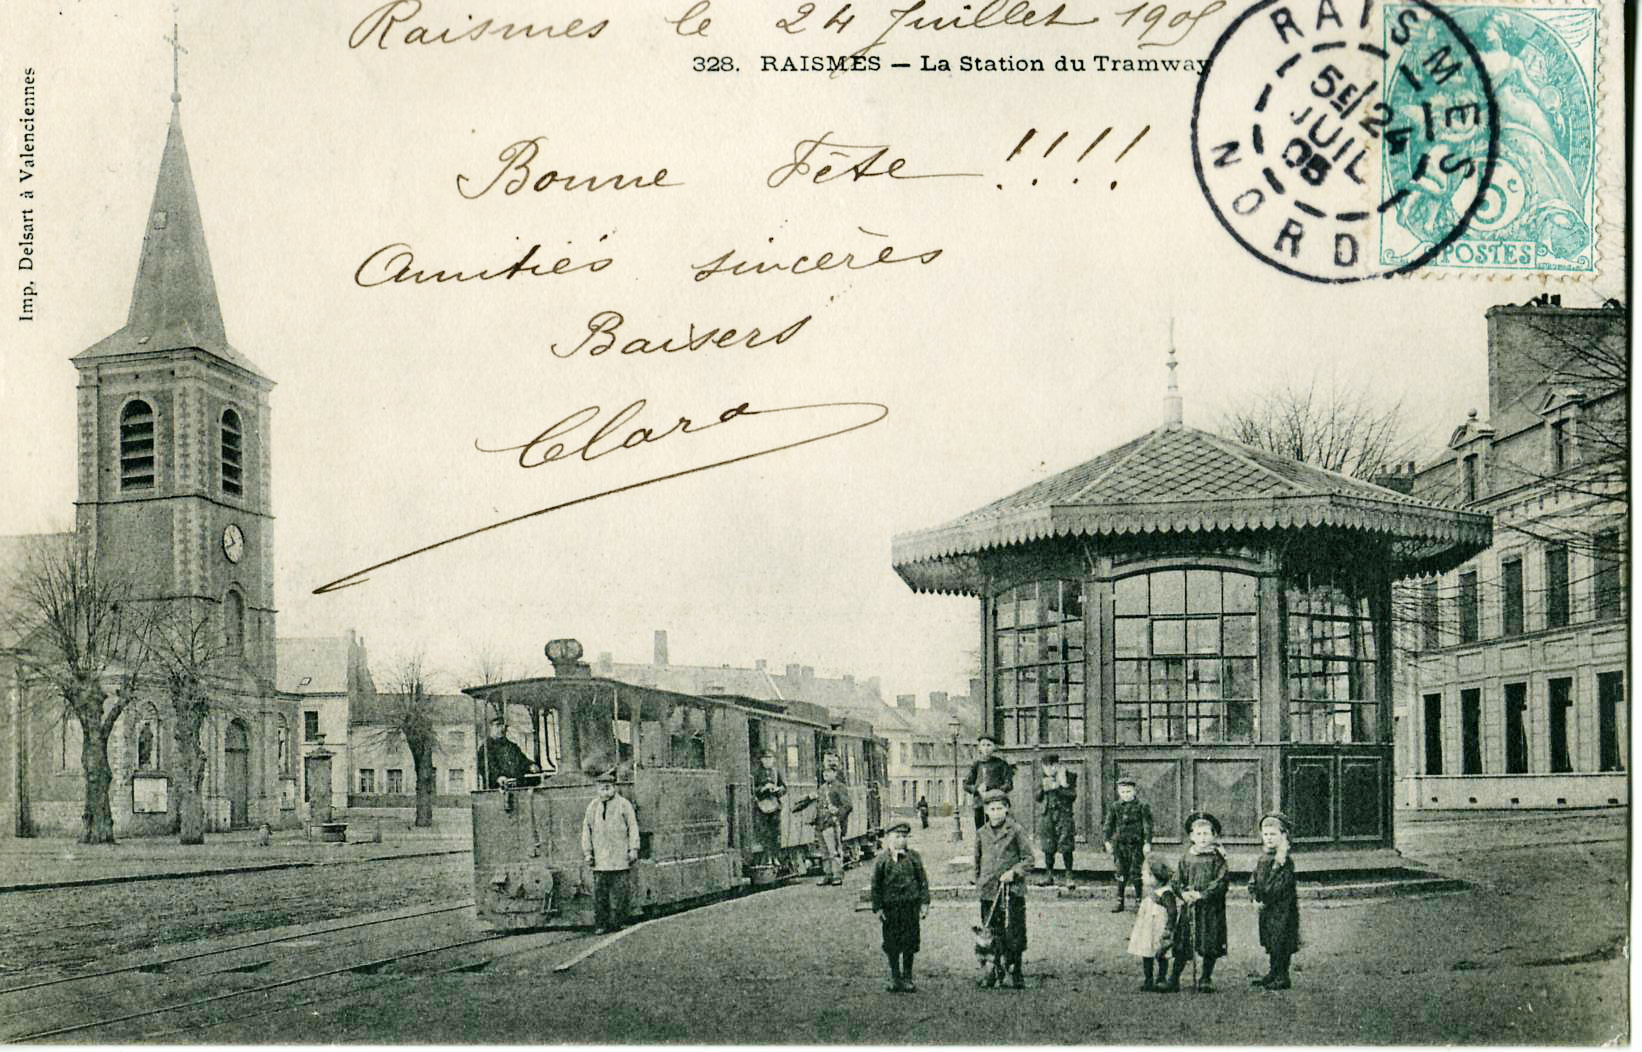 https://upload.wikimedia.org/wikipedia/commons/5/59/Delsart_328_-_RAISMES_-_La_Station_du_Tramway.JPG